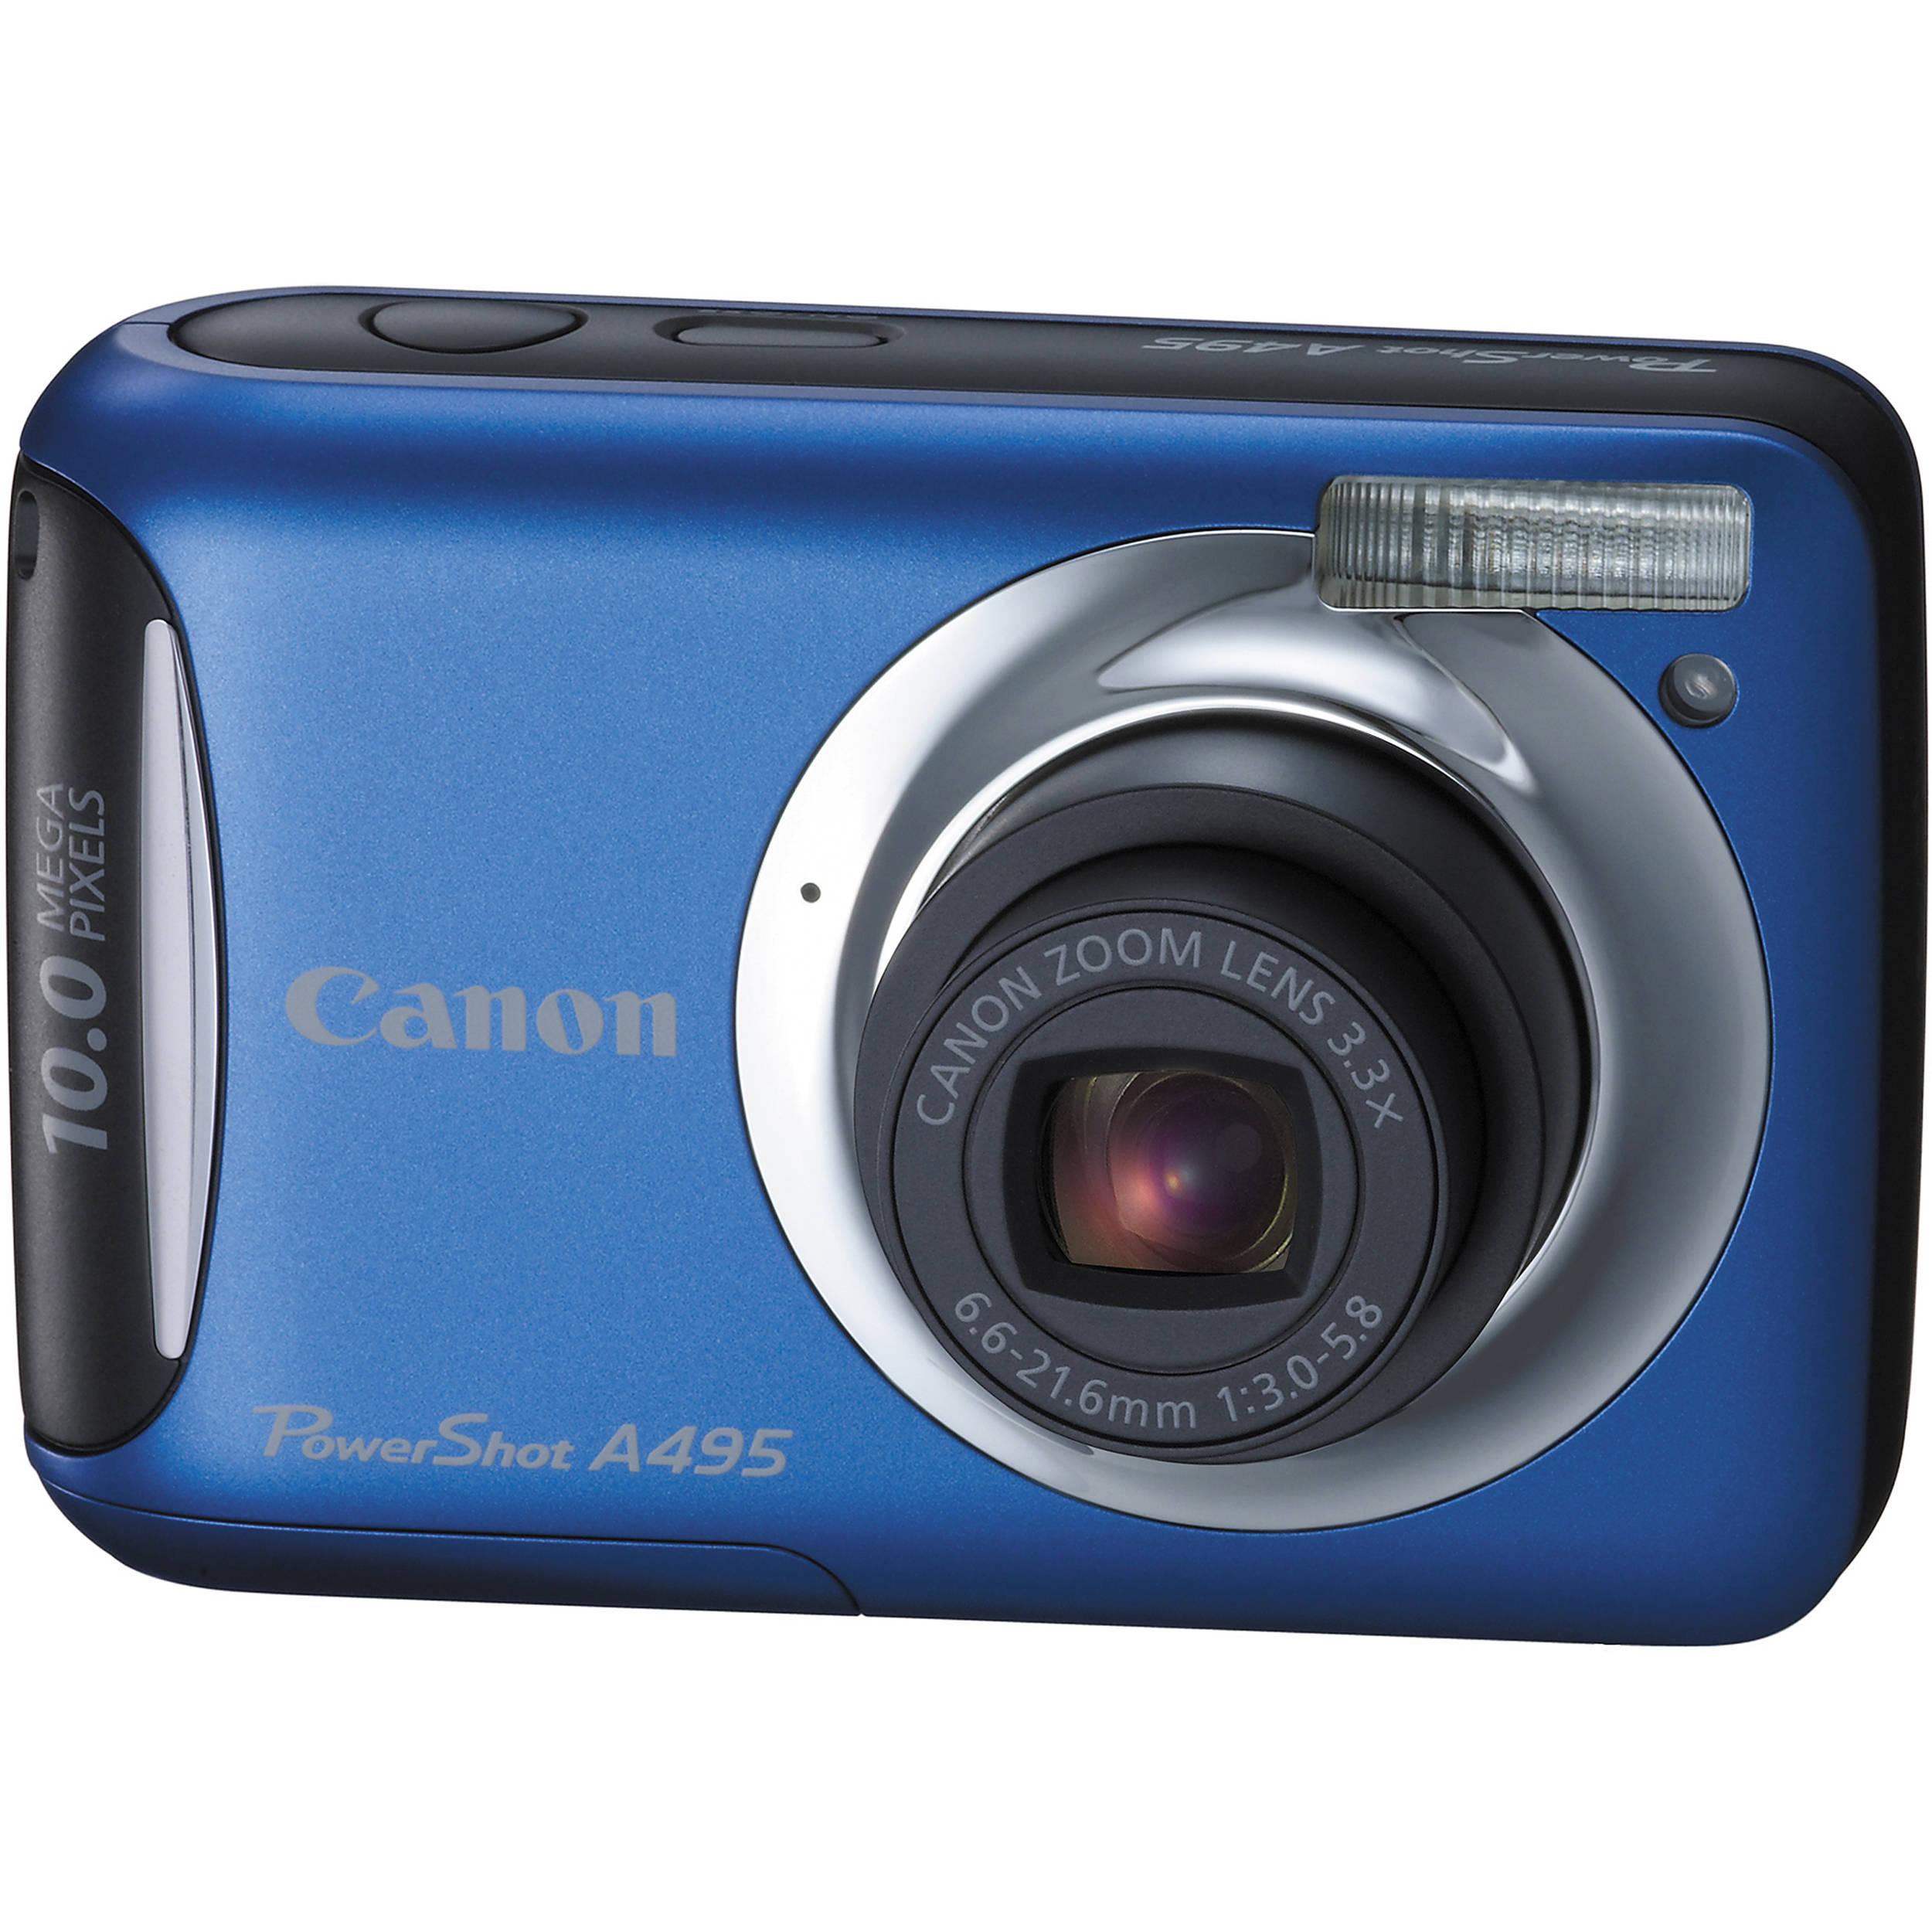 canon powershot a495 digital camera blue 4260b001 b h photo rh bhphotovideo com Canon PowerShot Digital Camera Canon PowerShot G12